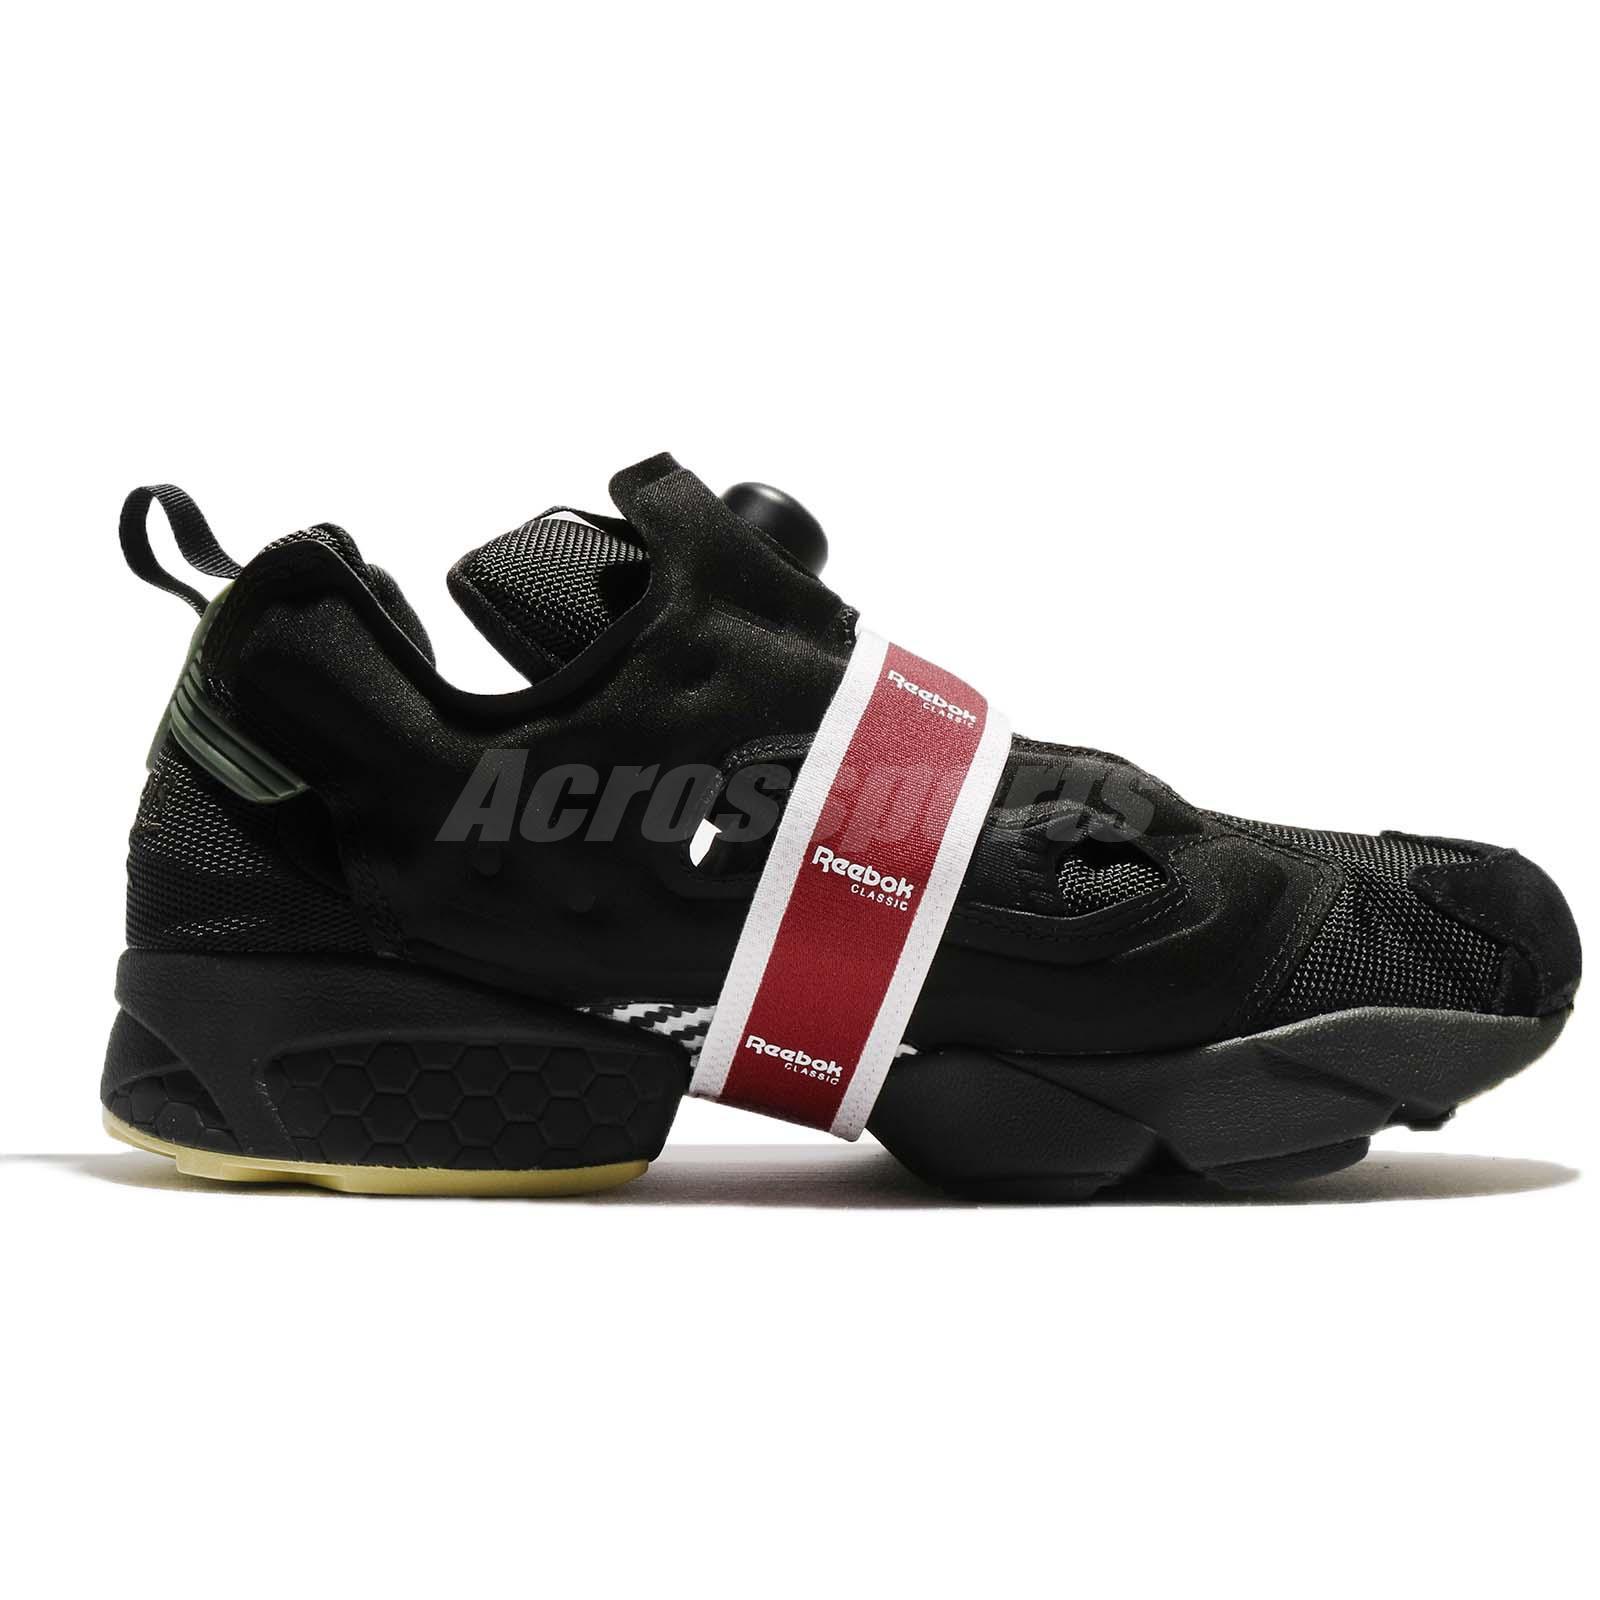 c9a246f91249 Reebok Instapump Fury OG MB Black Coal Red Men Running Shoes ...